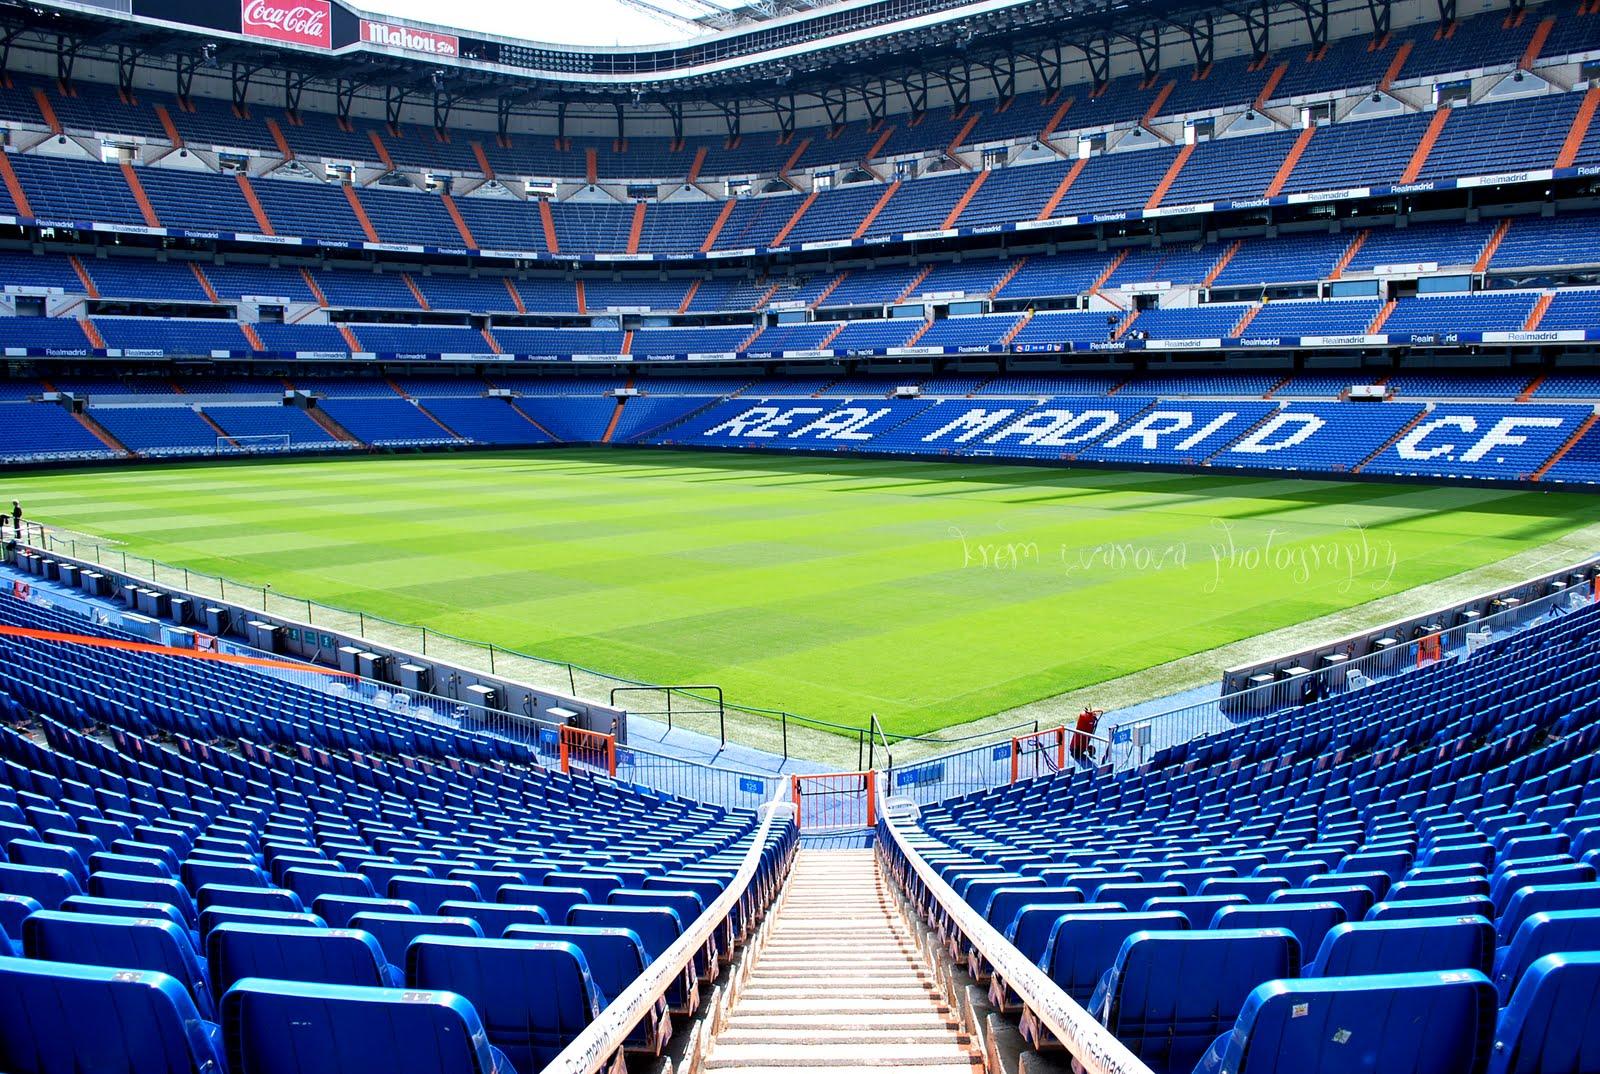 Santiago Bernabeu,things to do in Madrid